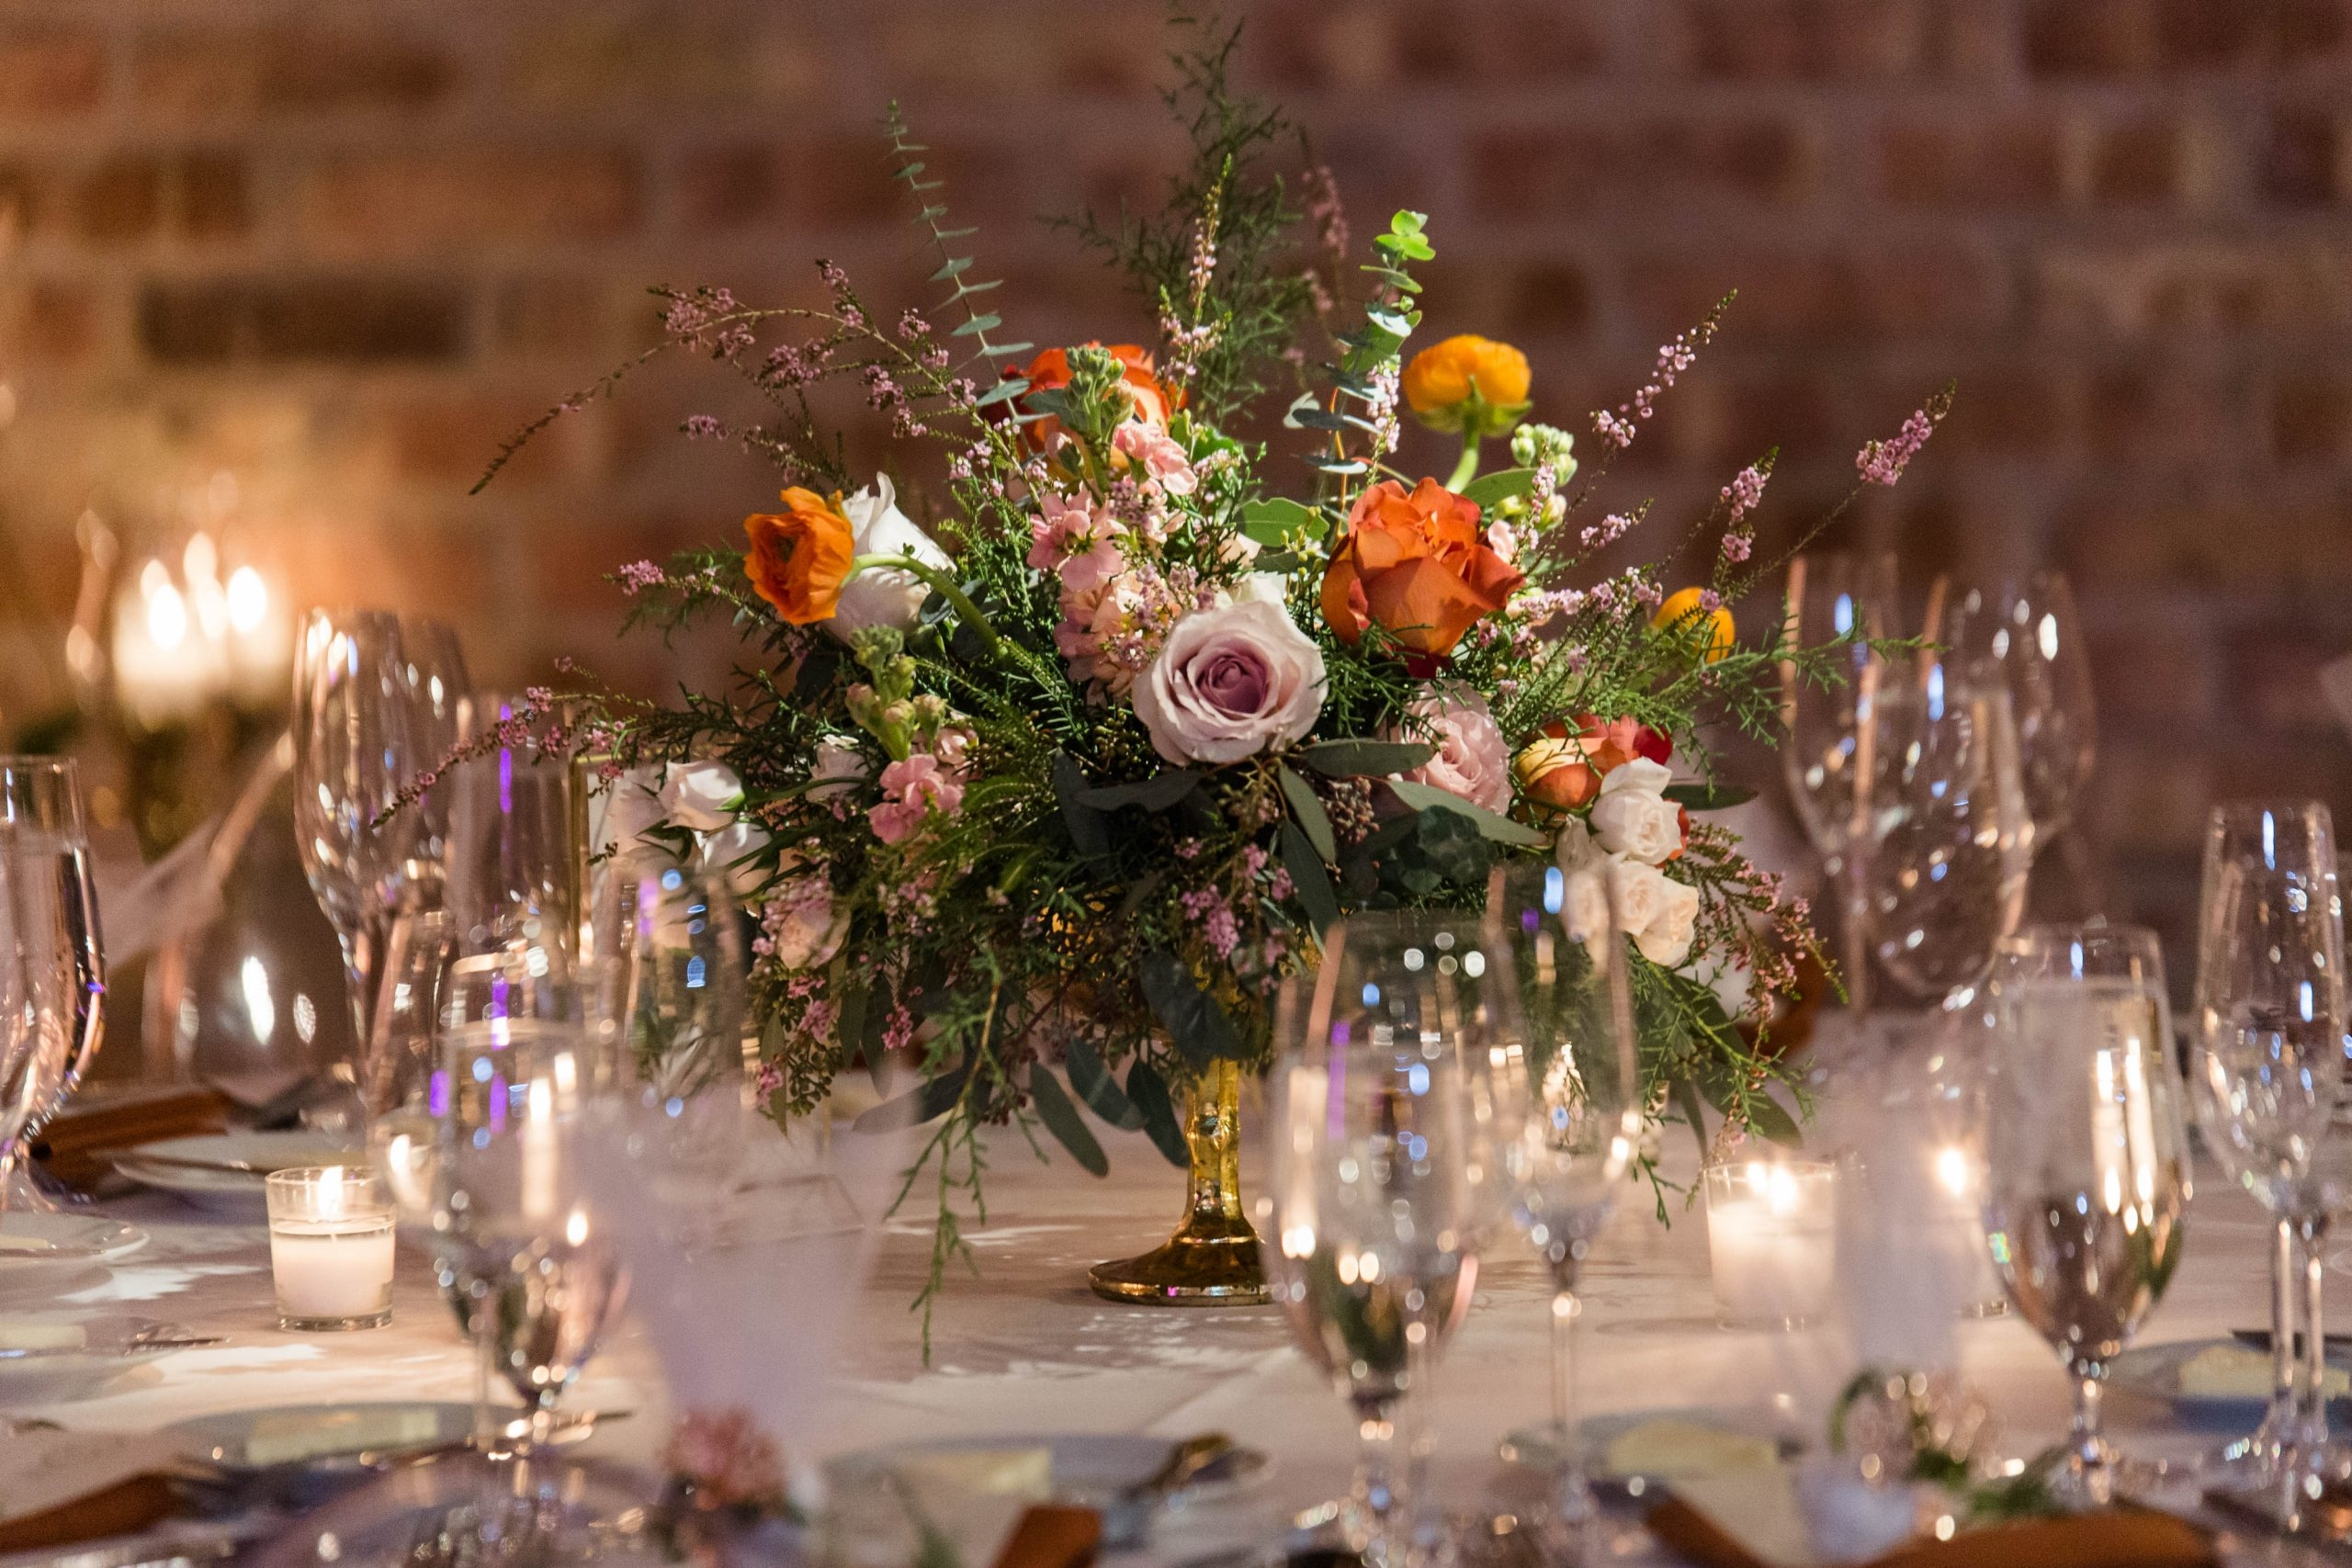 Romantic Winter Wedding Centerpiece